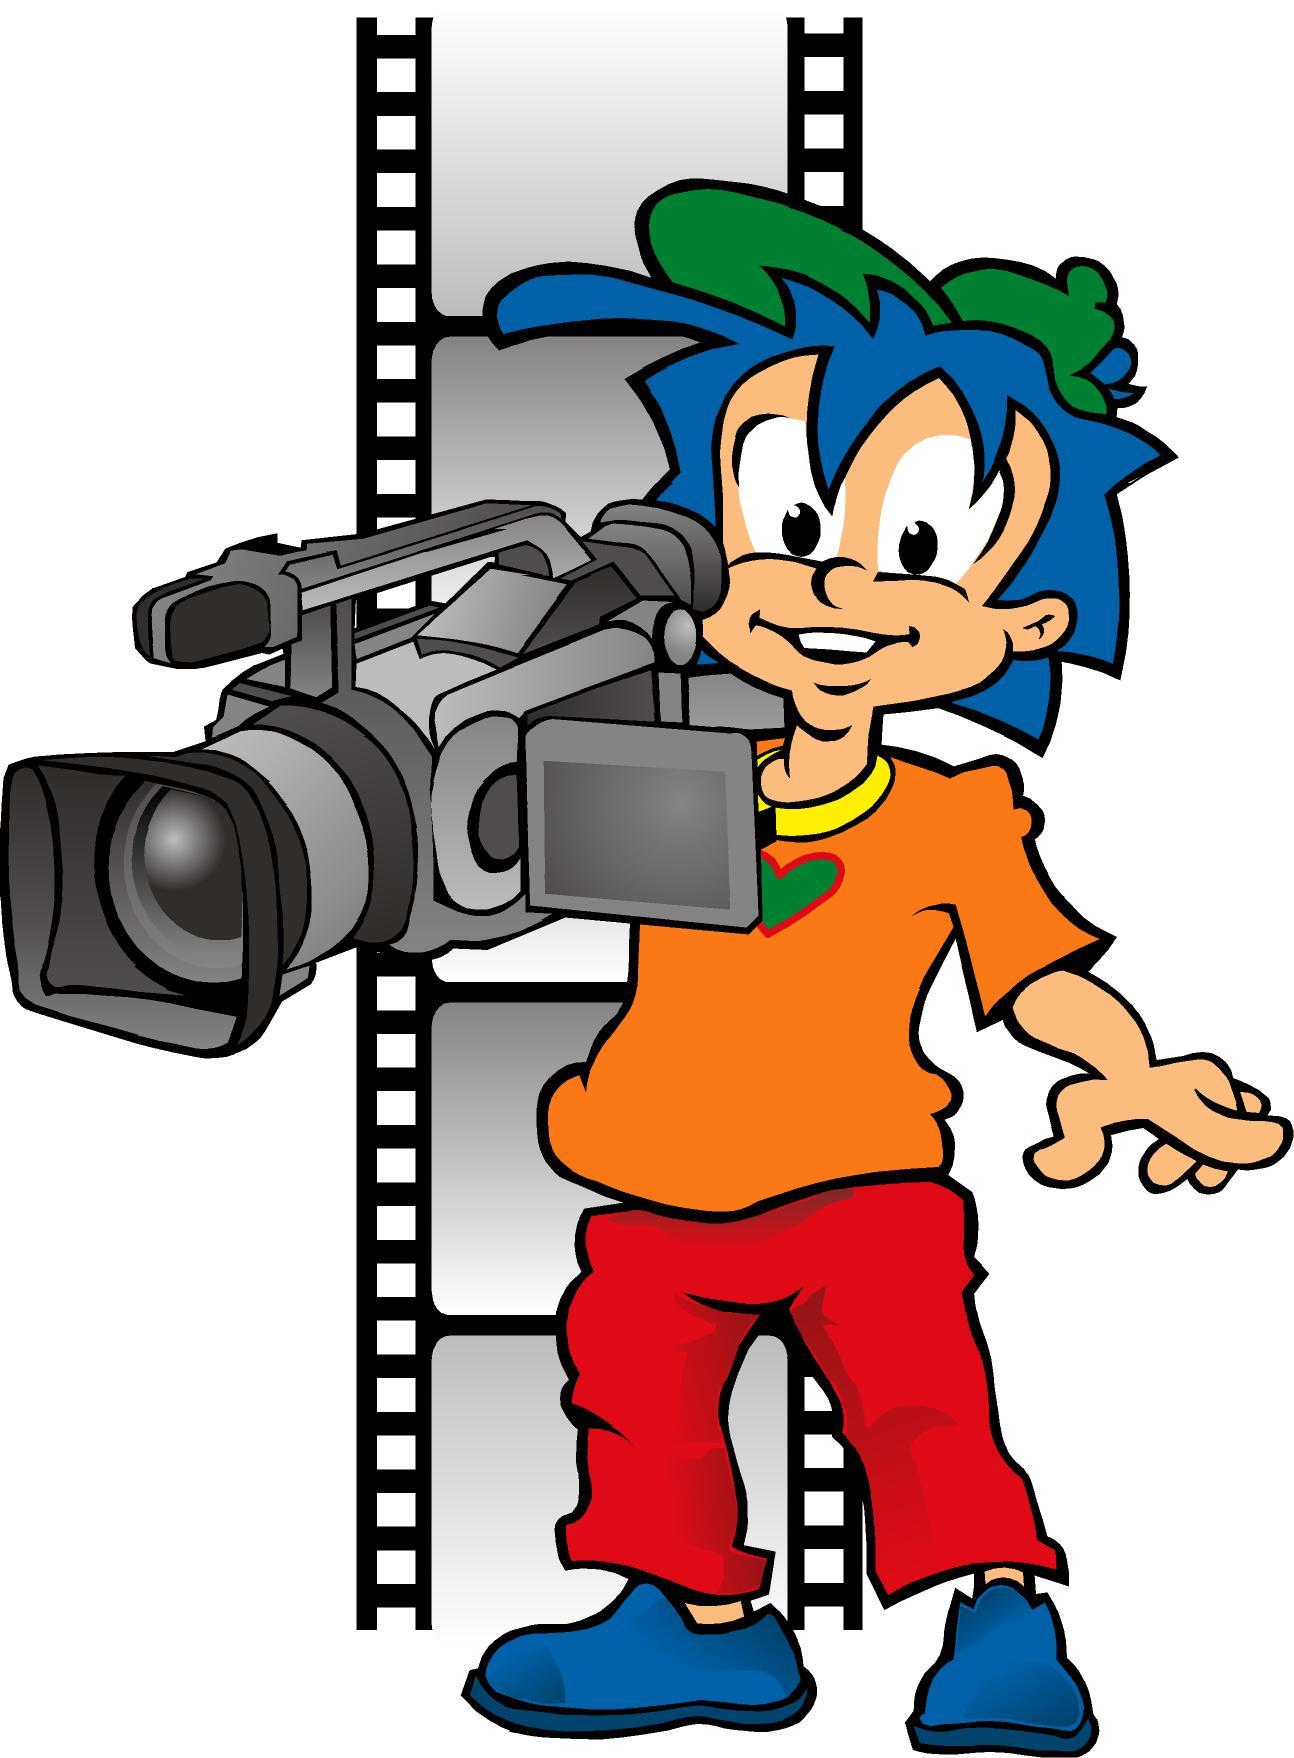 Skapa film med Rafiki